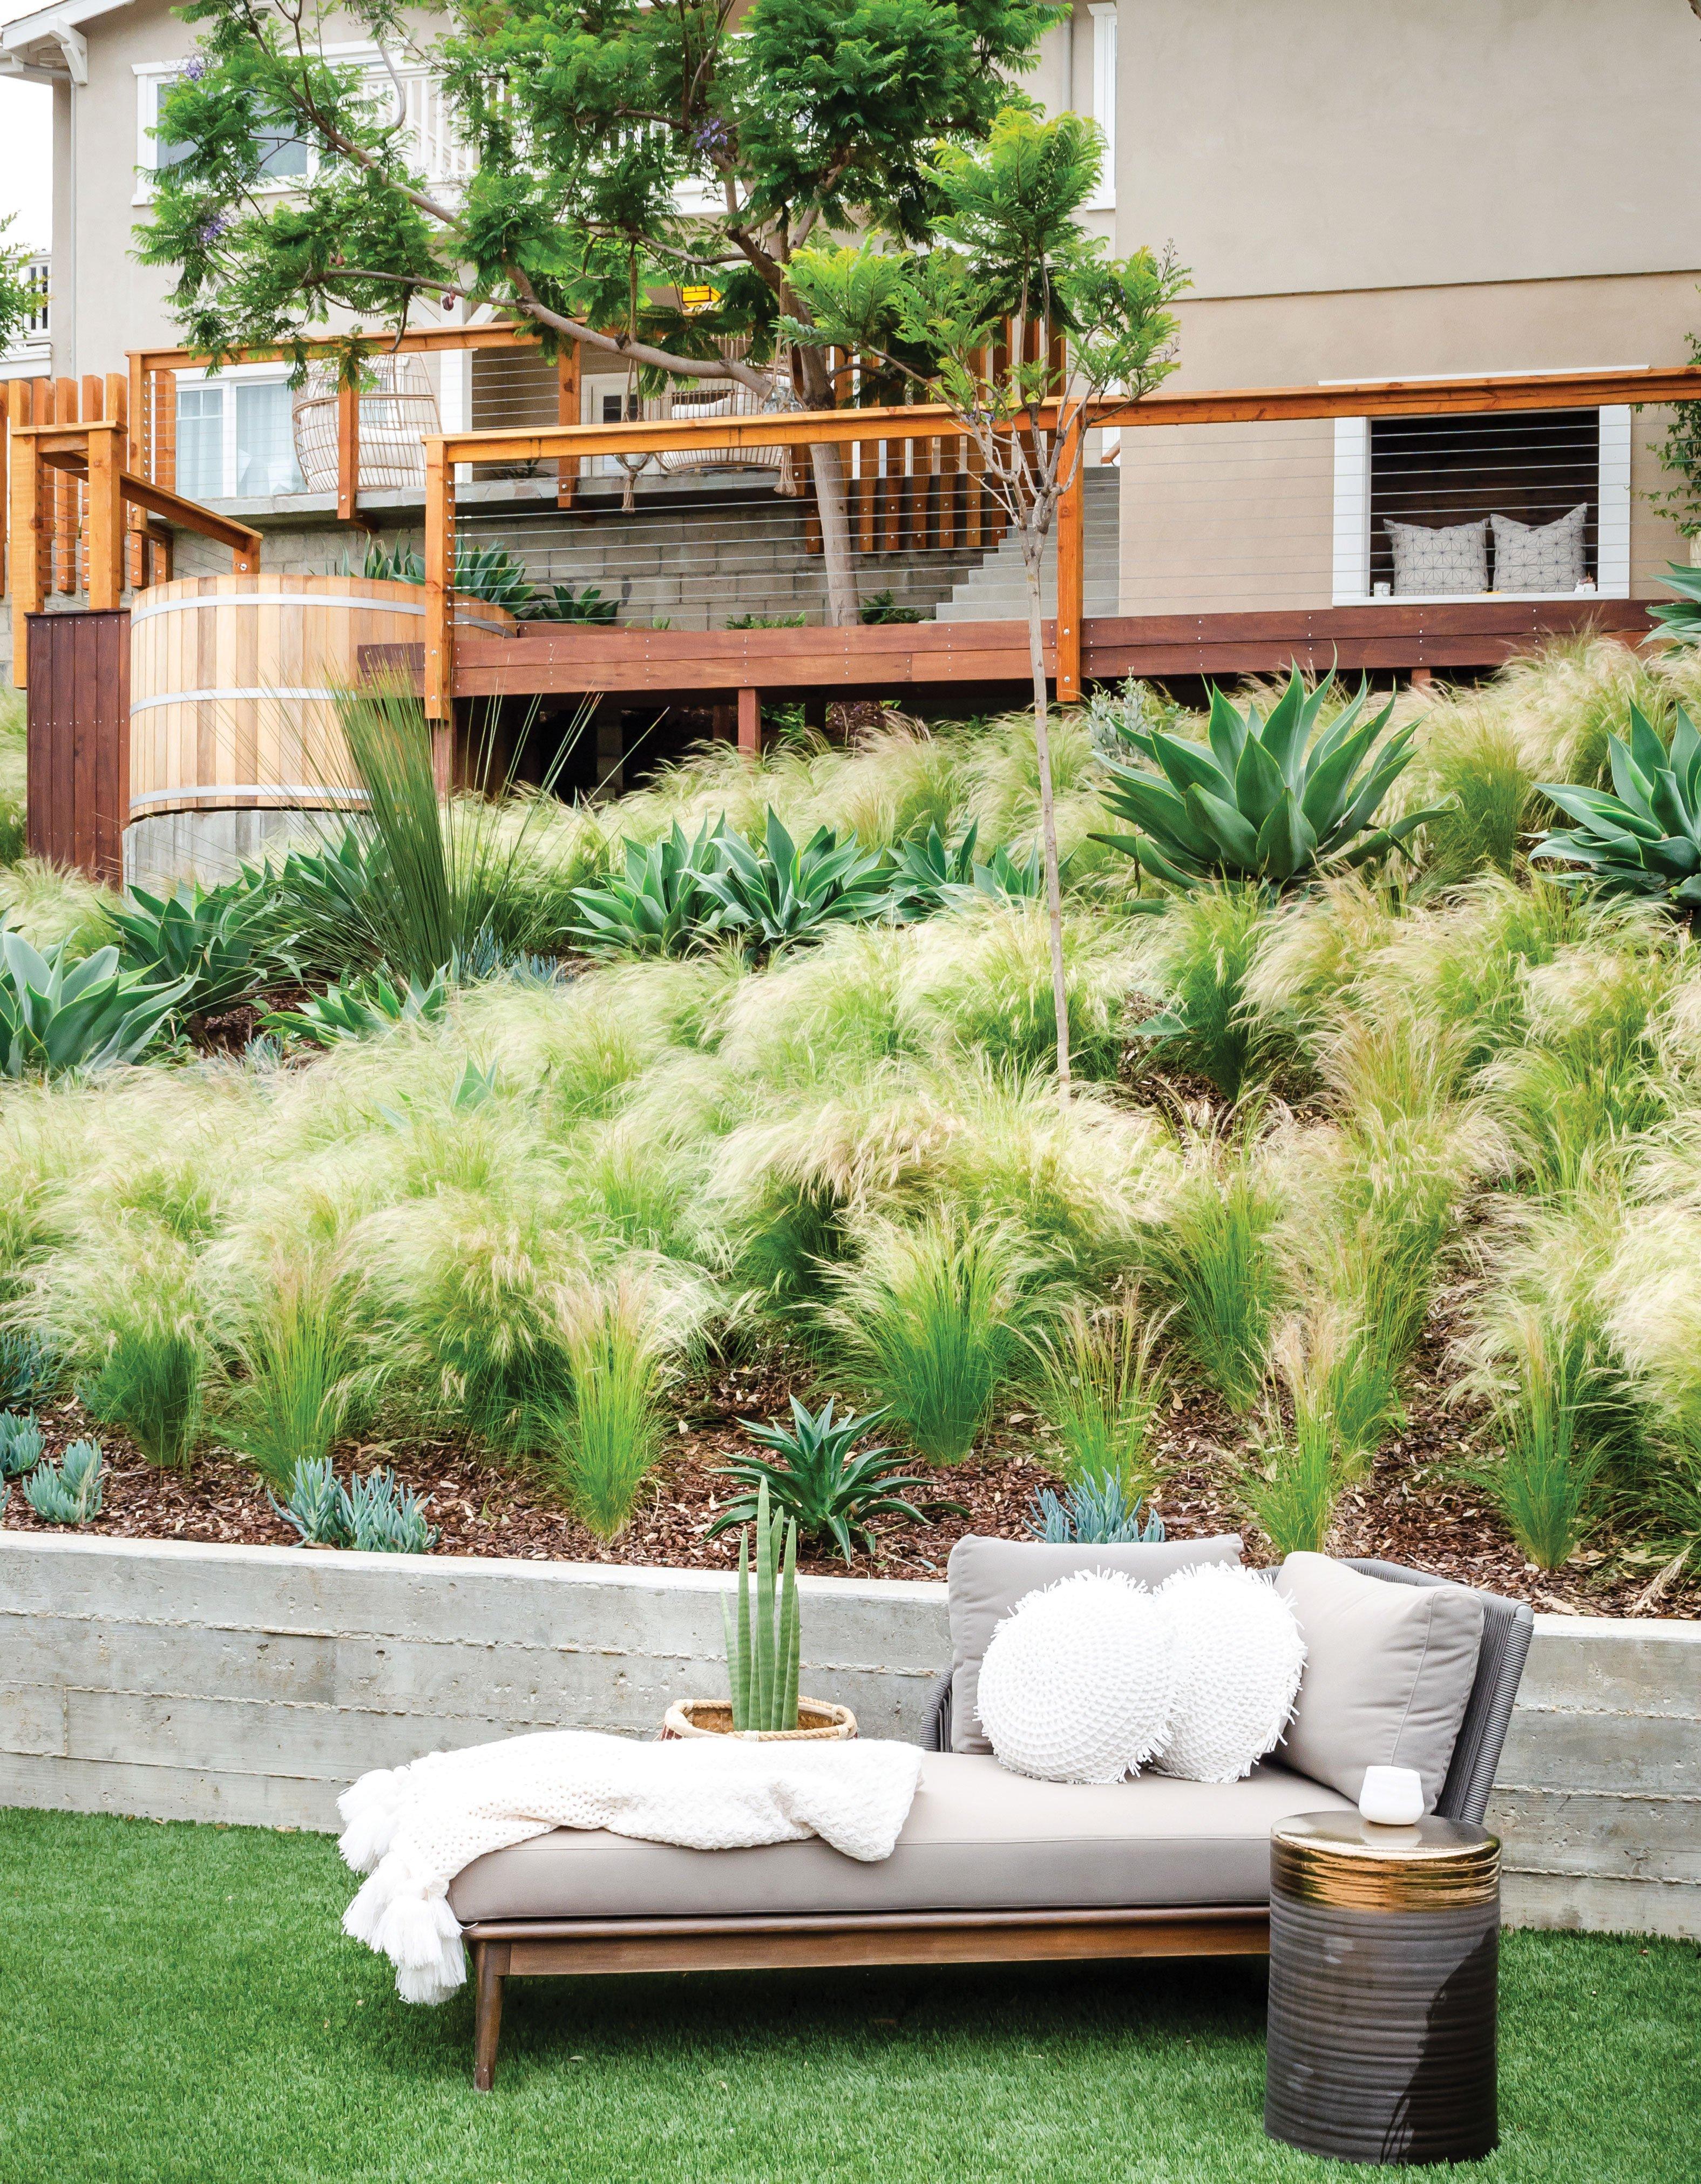 lounge chair tiered garden tiers terrace